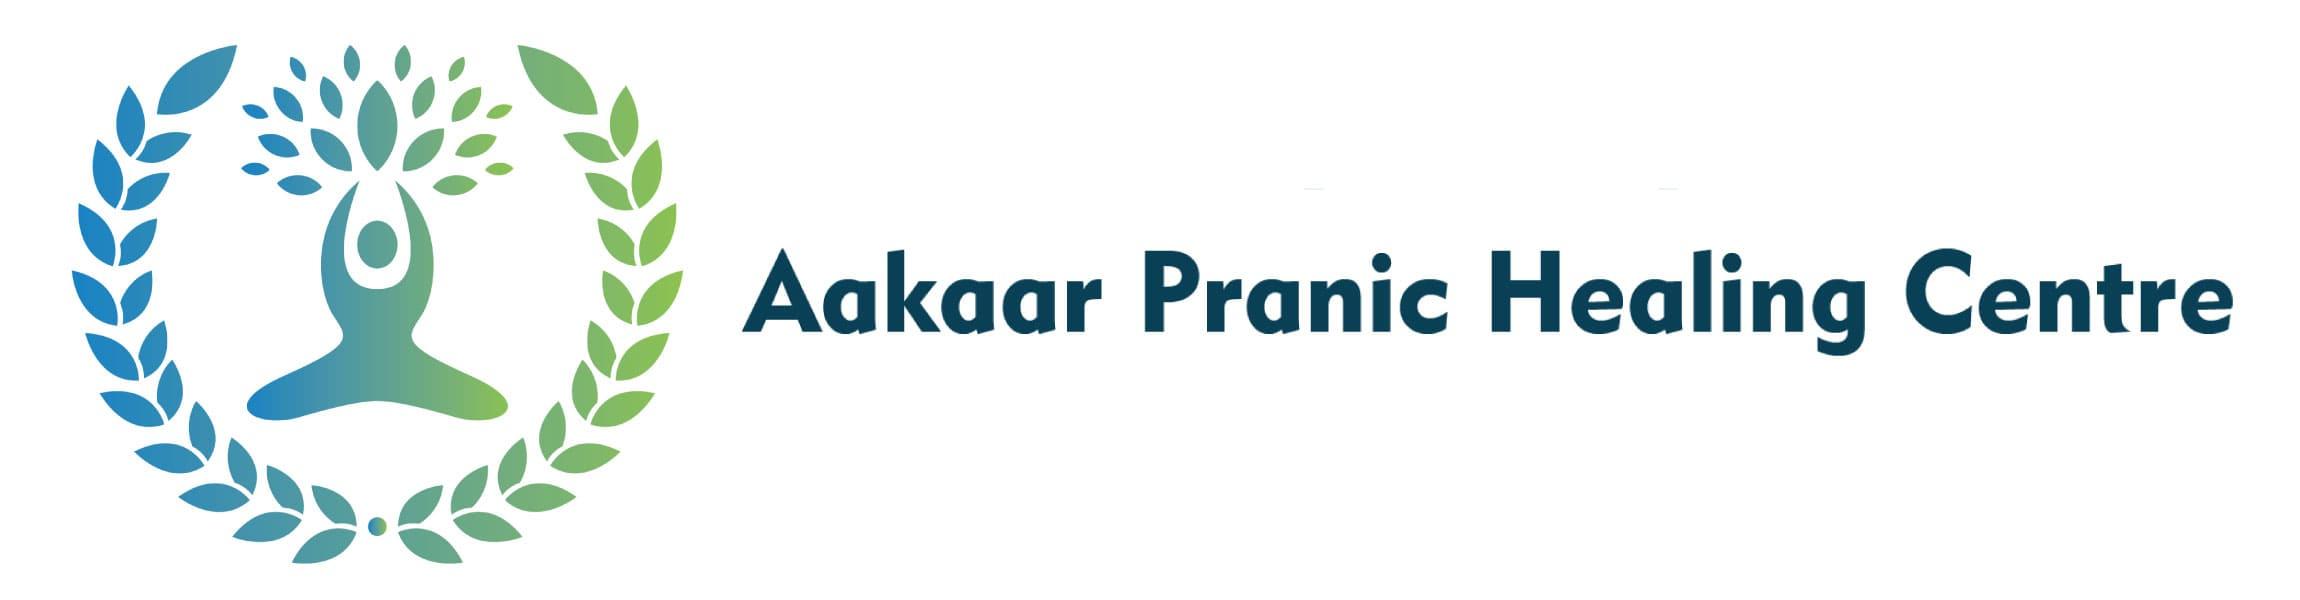 Aakaar Pranic Healing Center